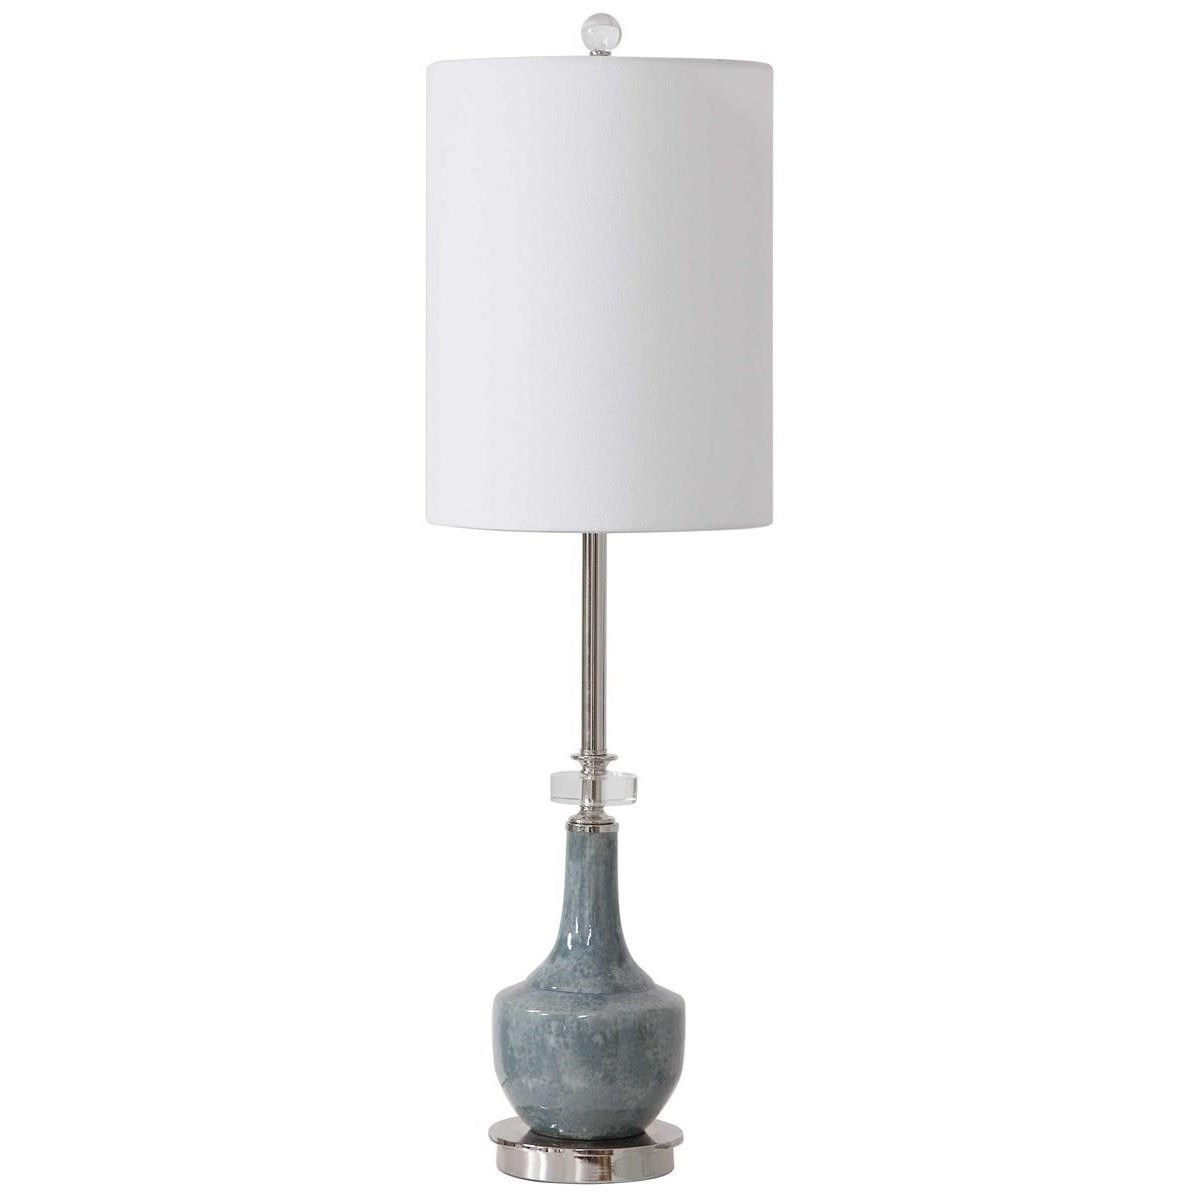 Buffet Lamps Piers Mottled Blue Buffet Lamp by Uttermost at Mueller Furniture